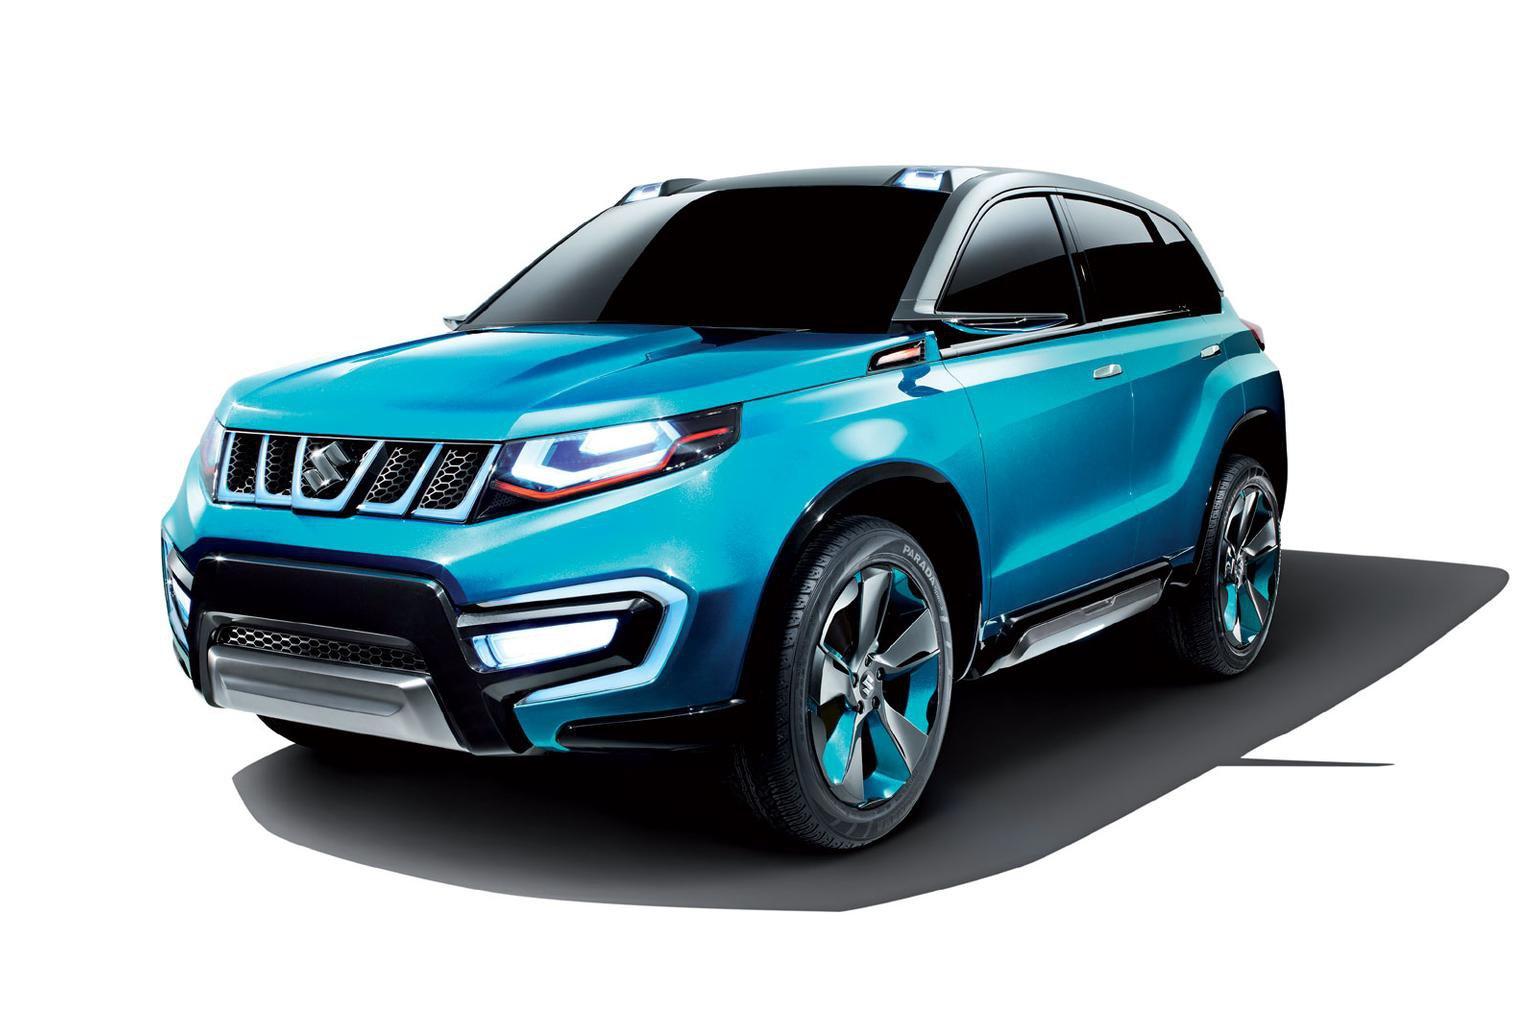 Suzuki IV-4 concept SUV unveiled